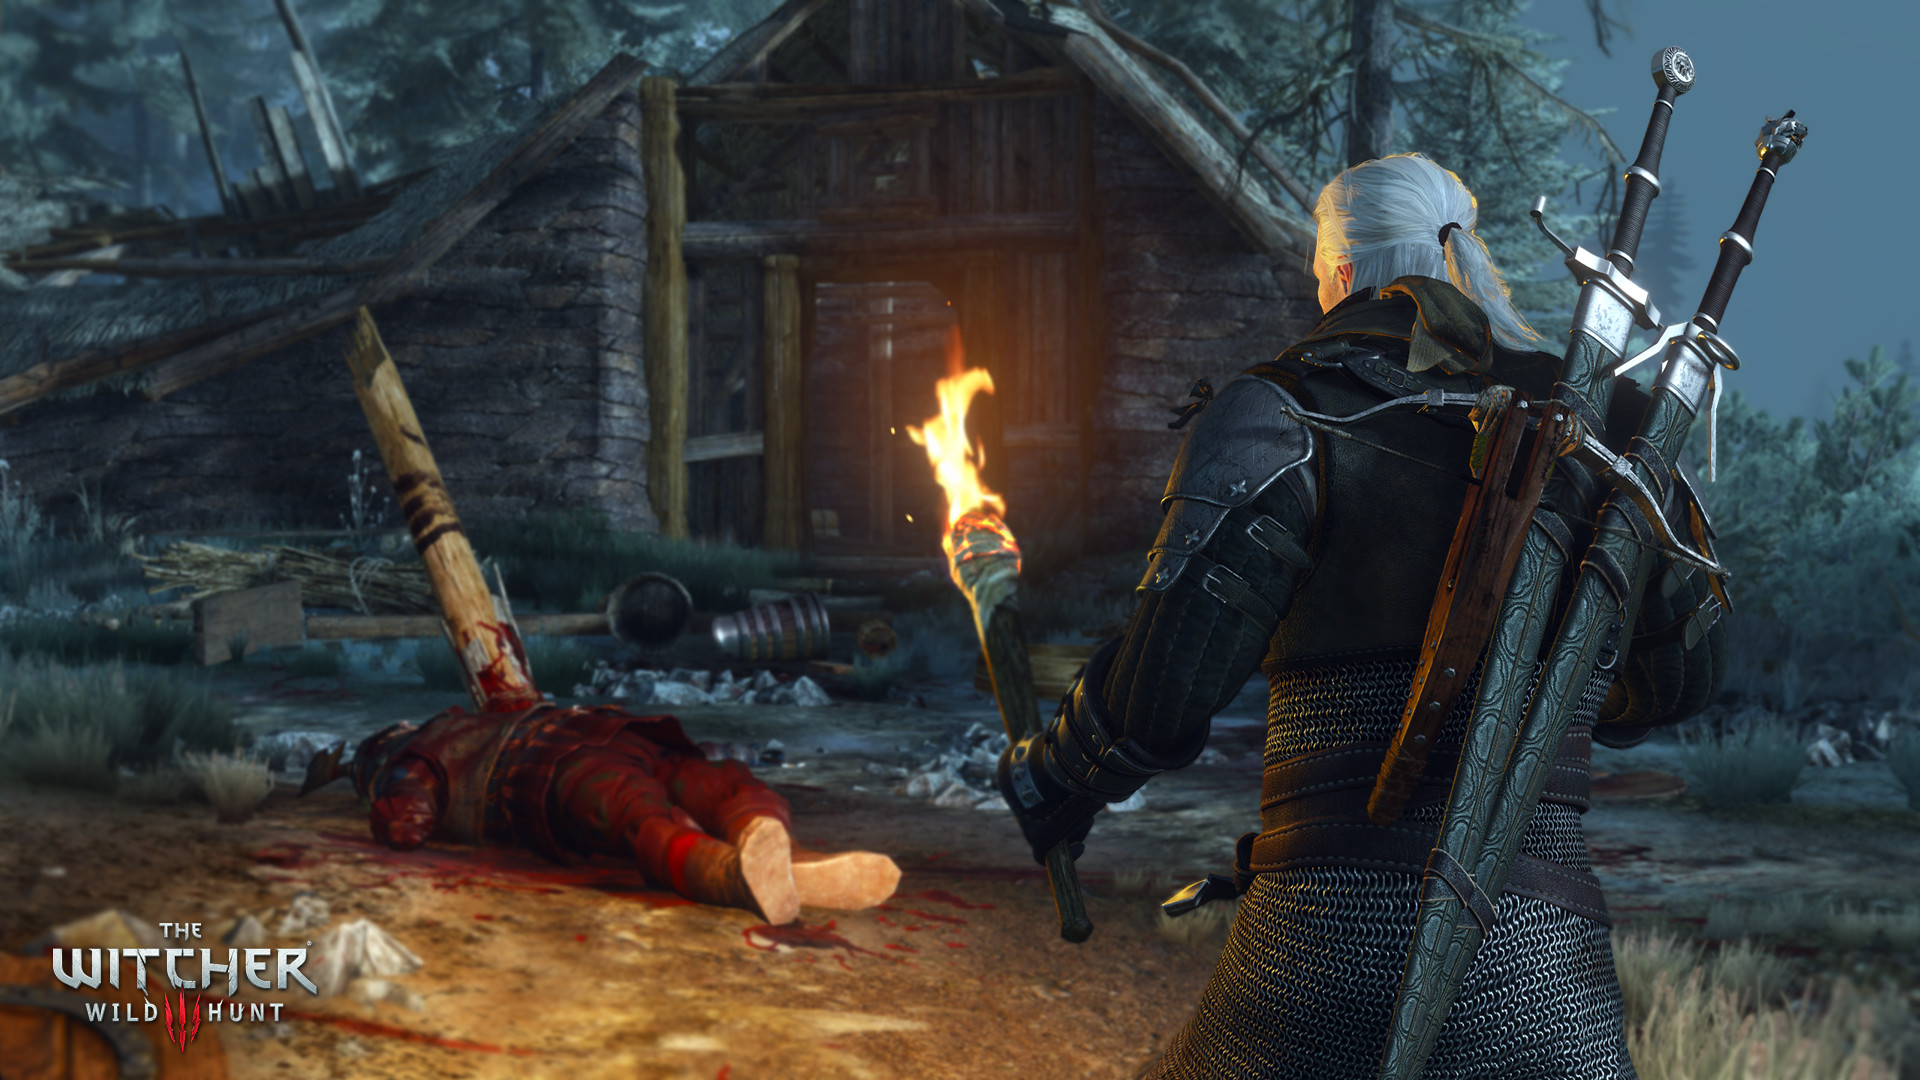 Моддер показал, насколько он улучшил графику в Witcher 3: Blood and Wine